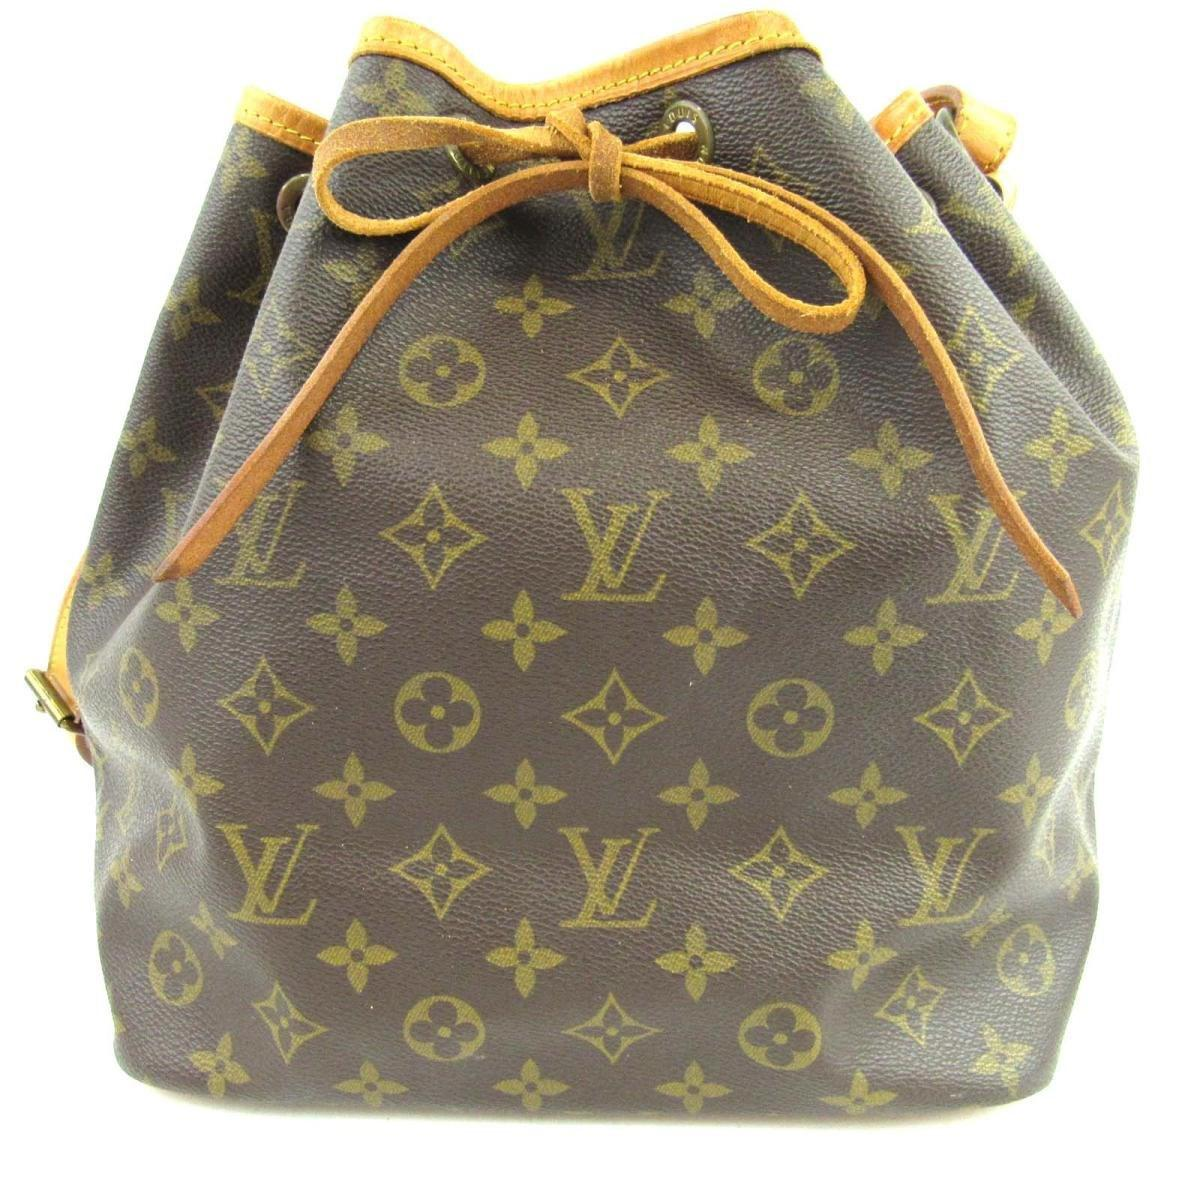 c79c02f2e3d84 Louis Vuitton Auth Petite Noe Shoulder Bag M42226 Monogram Used ...